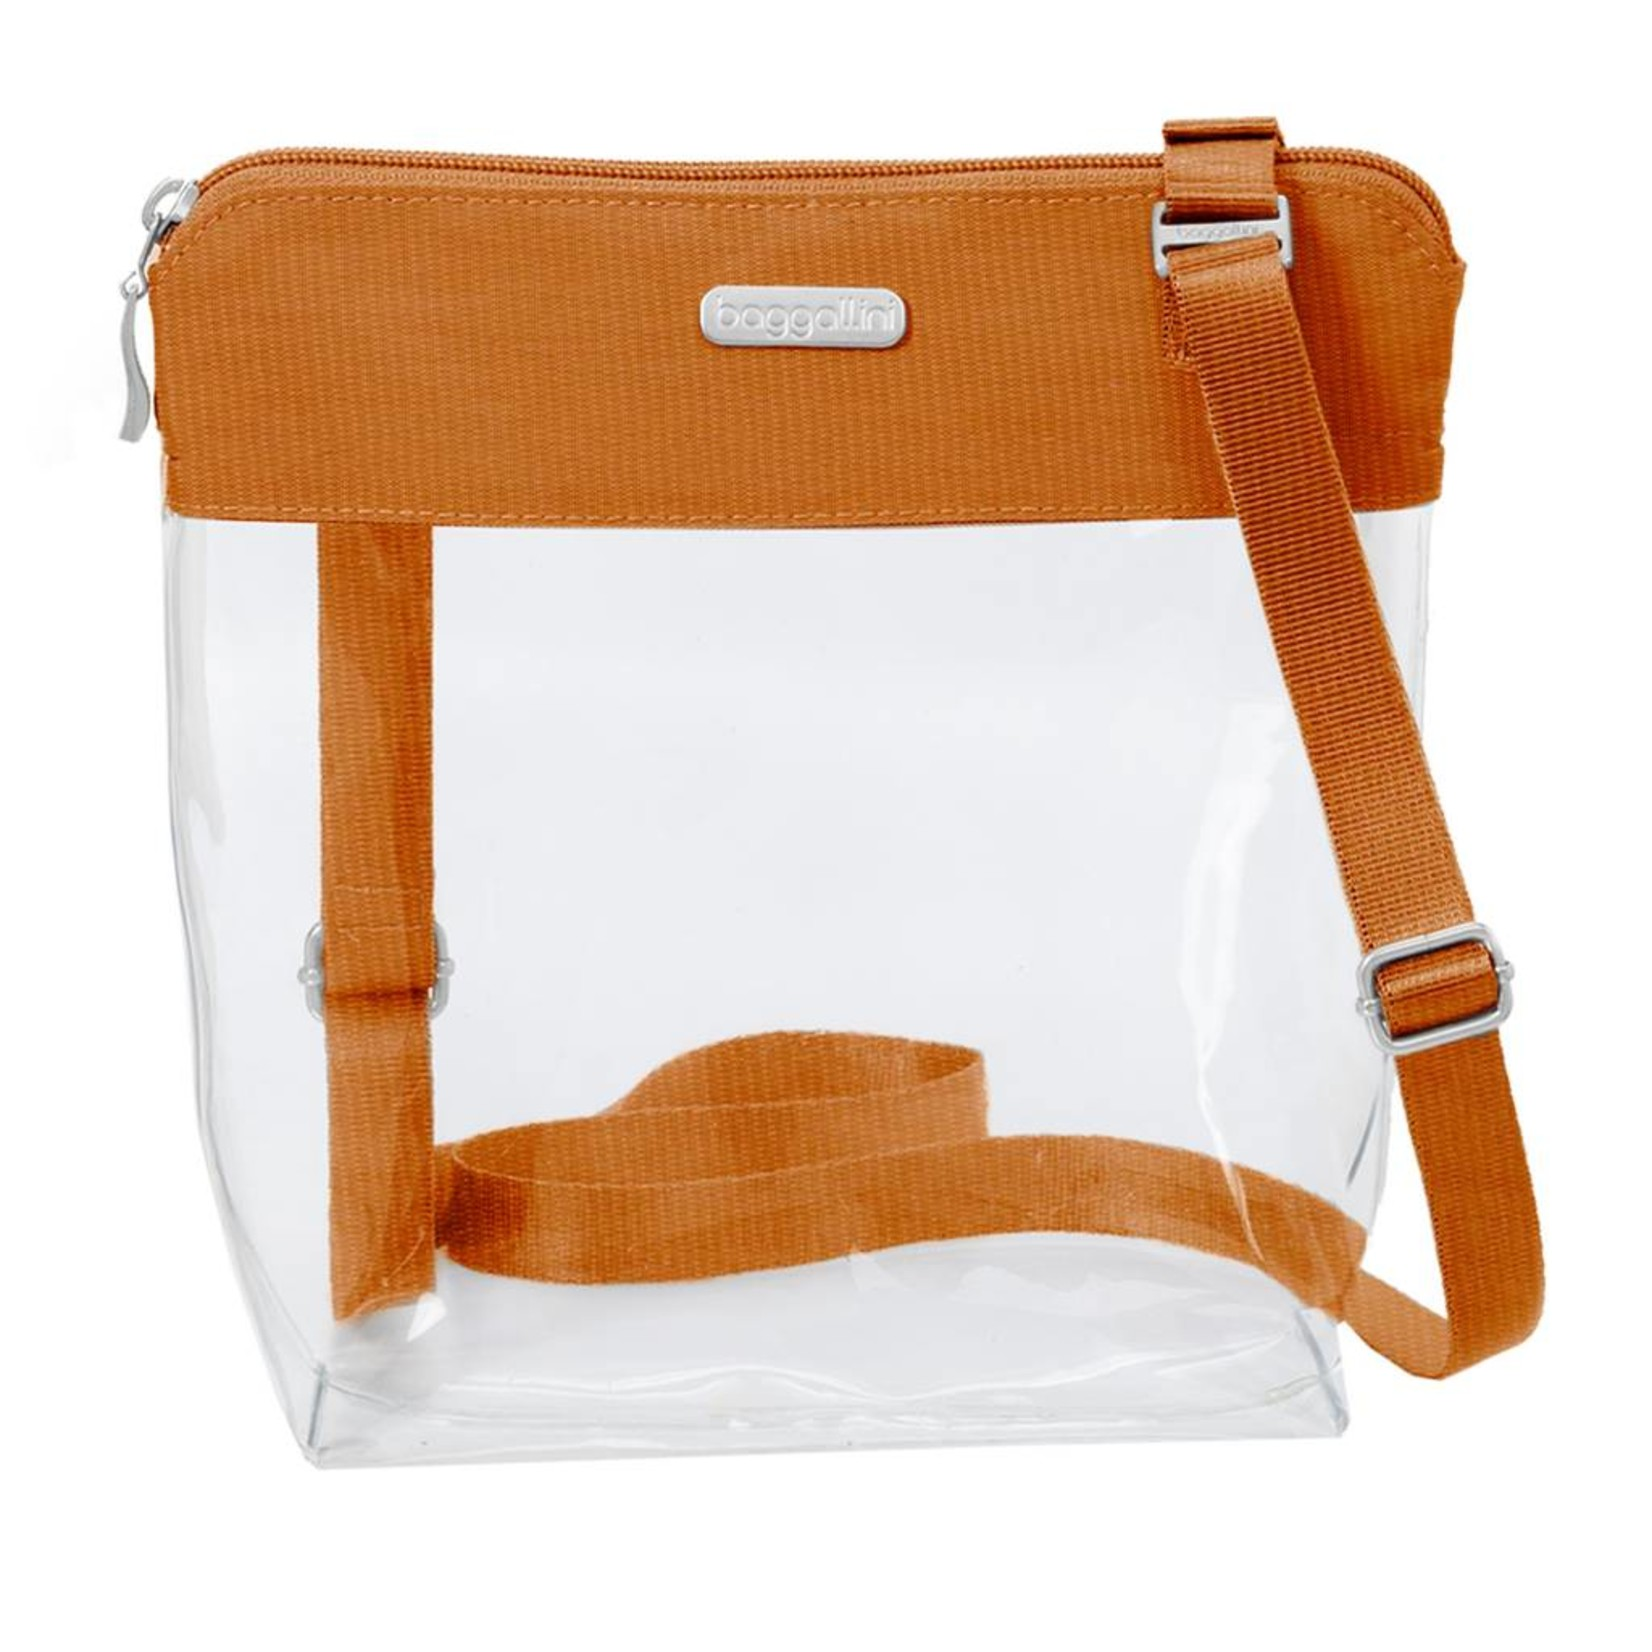 Baggallini Clear Event Compliant Pocket Crossbody - Orange